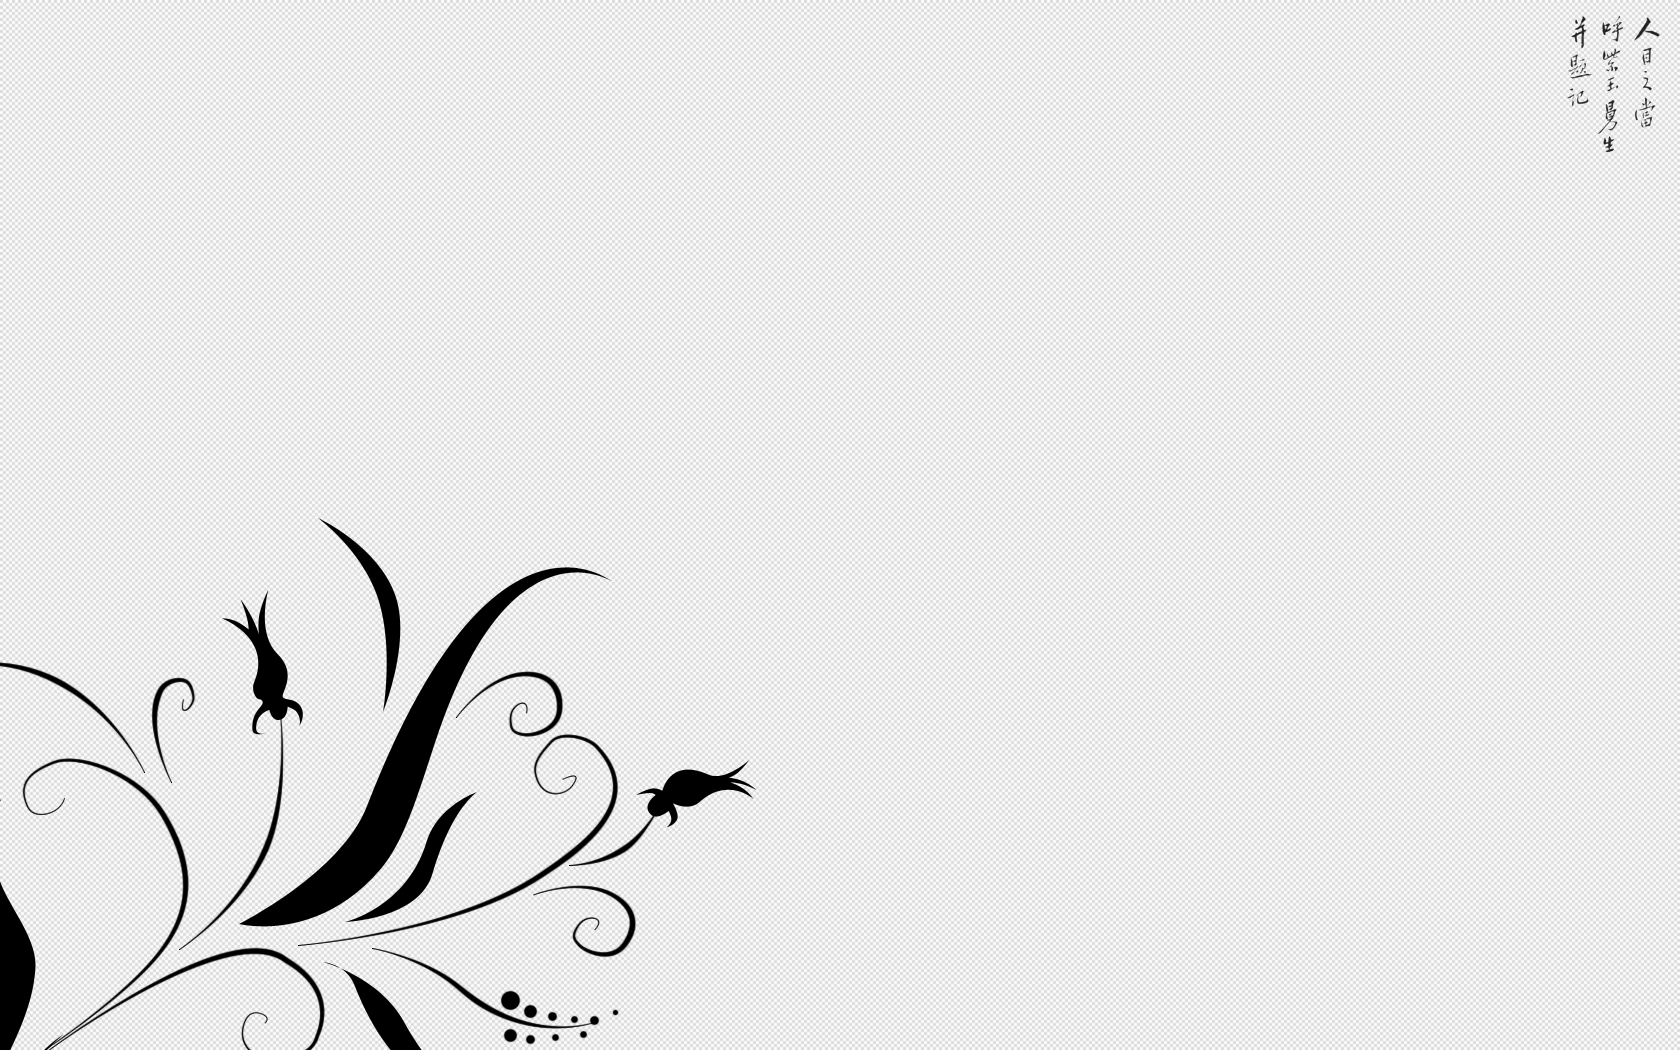 White abstract desktop wallpaper 14 | Wallpaper